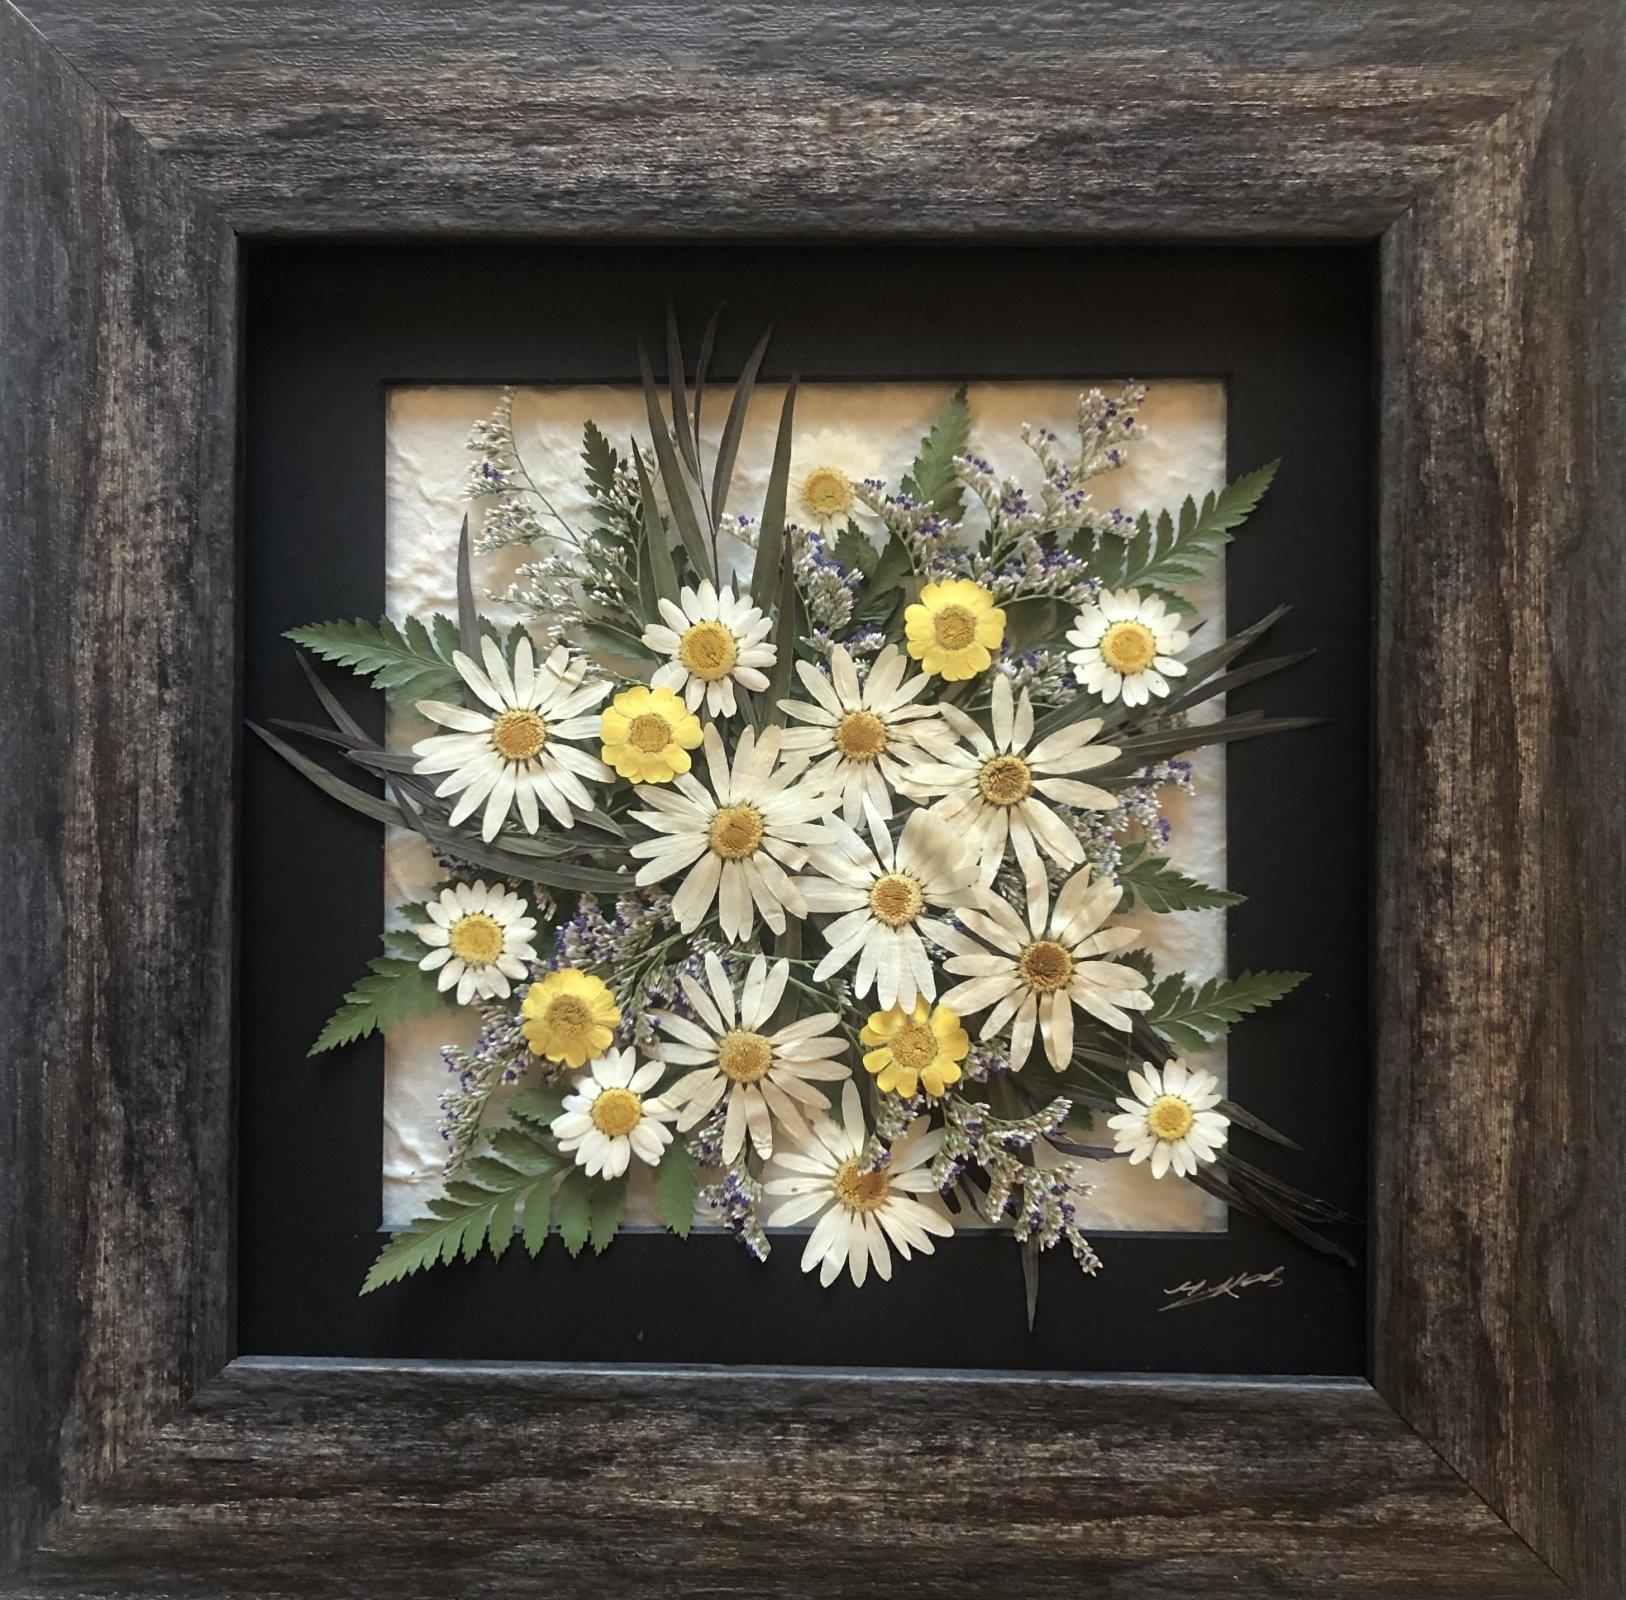 13' x 13 Pressed Flower